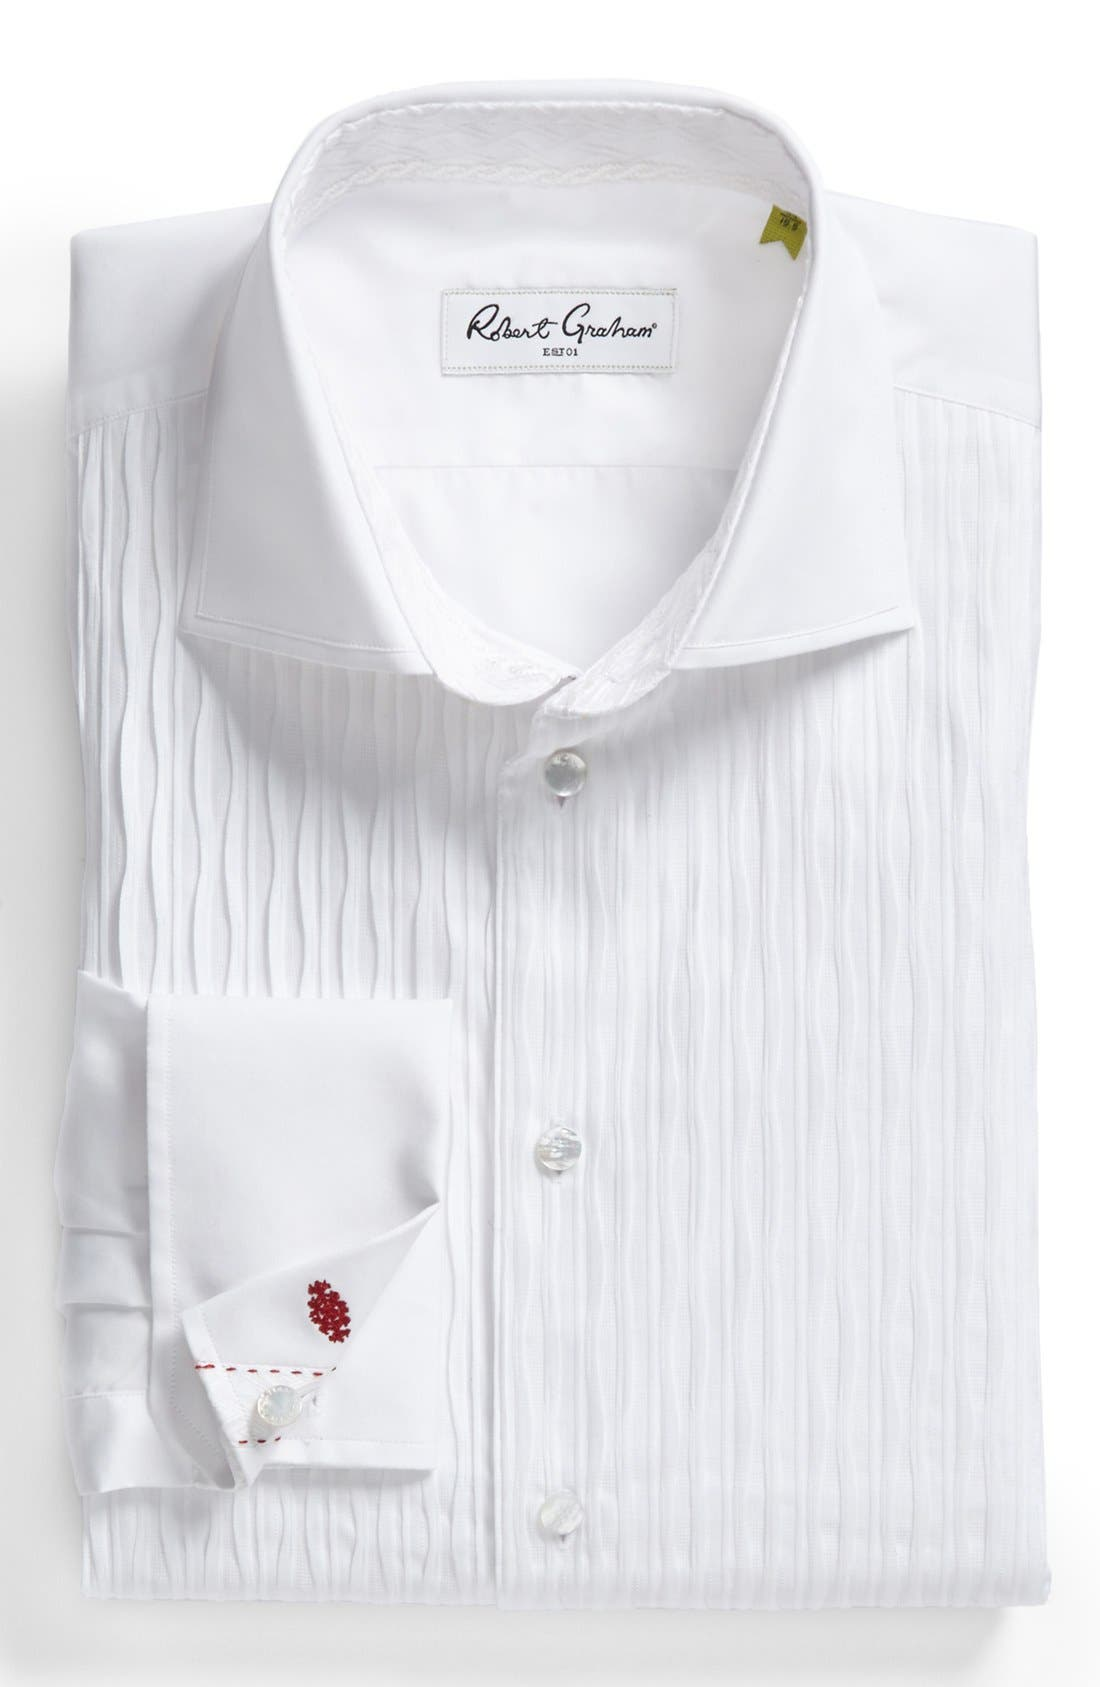 Regular Fit Tuxedo Shirt, Main, color, 100